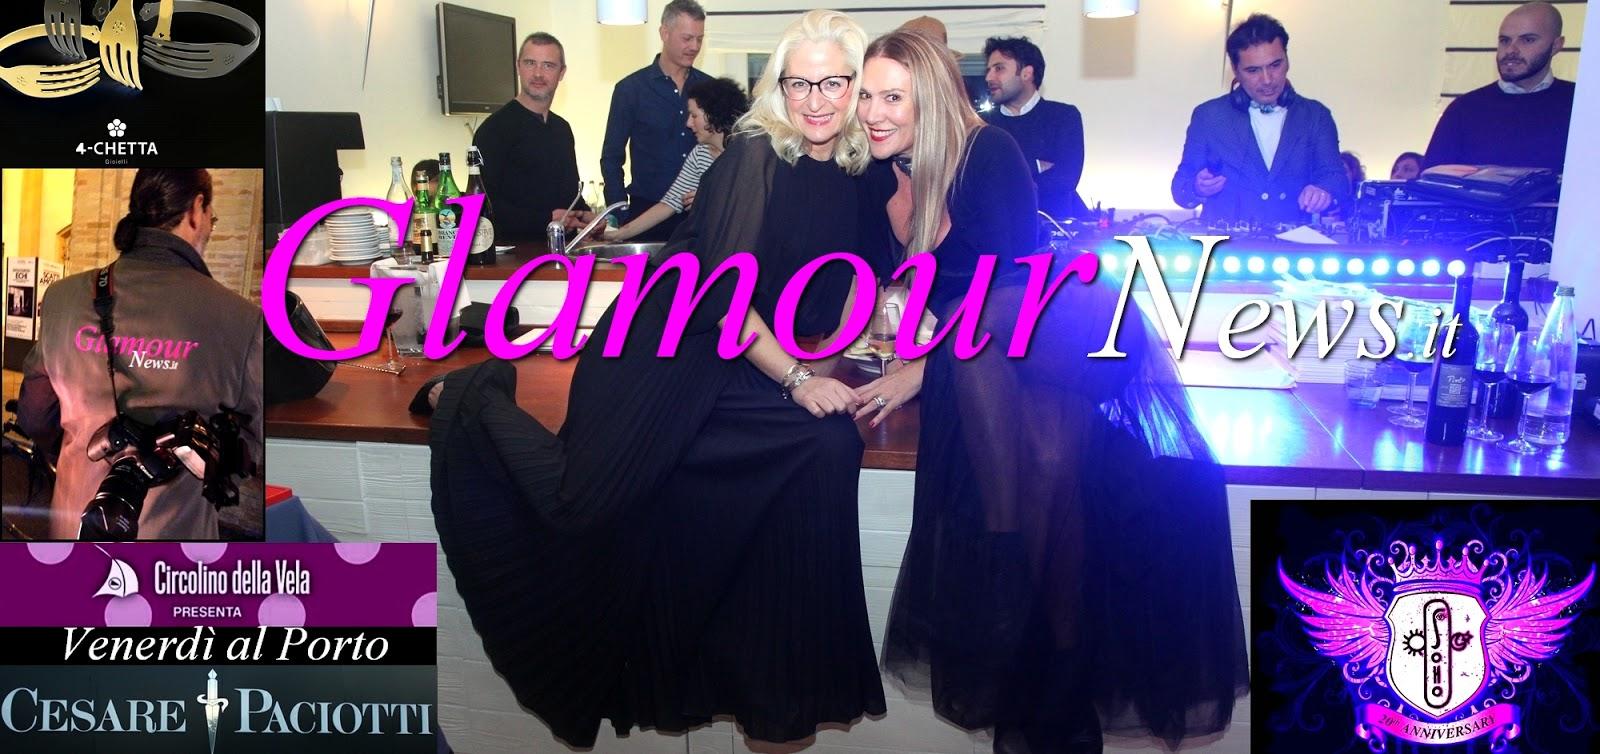 Glamour incontri